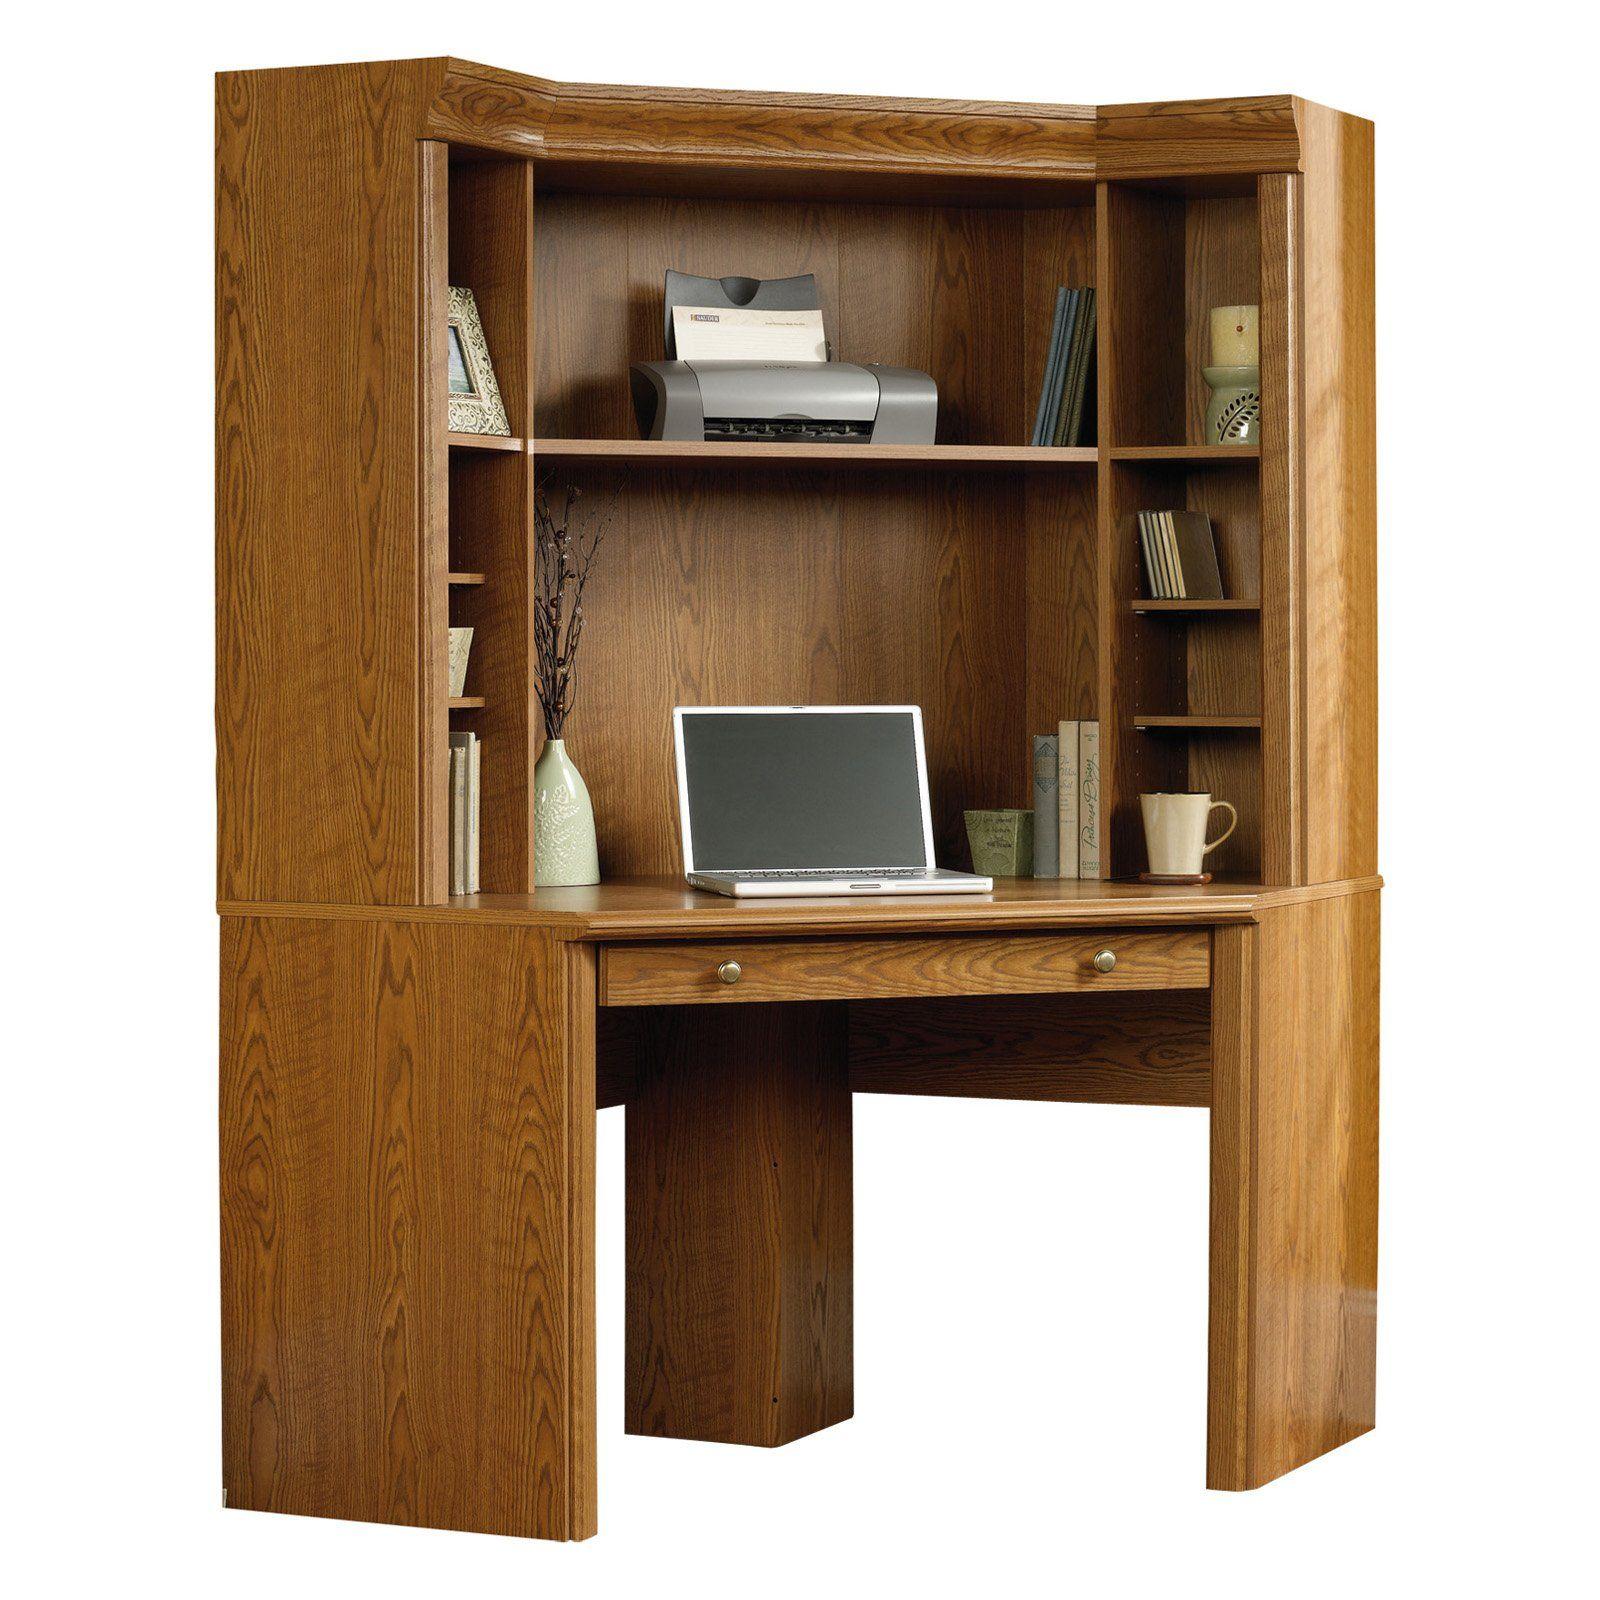 Corner Desk With Hutch | Corner Computer Desk With Hutch By Sauder